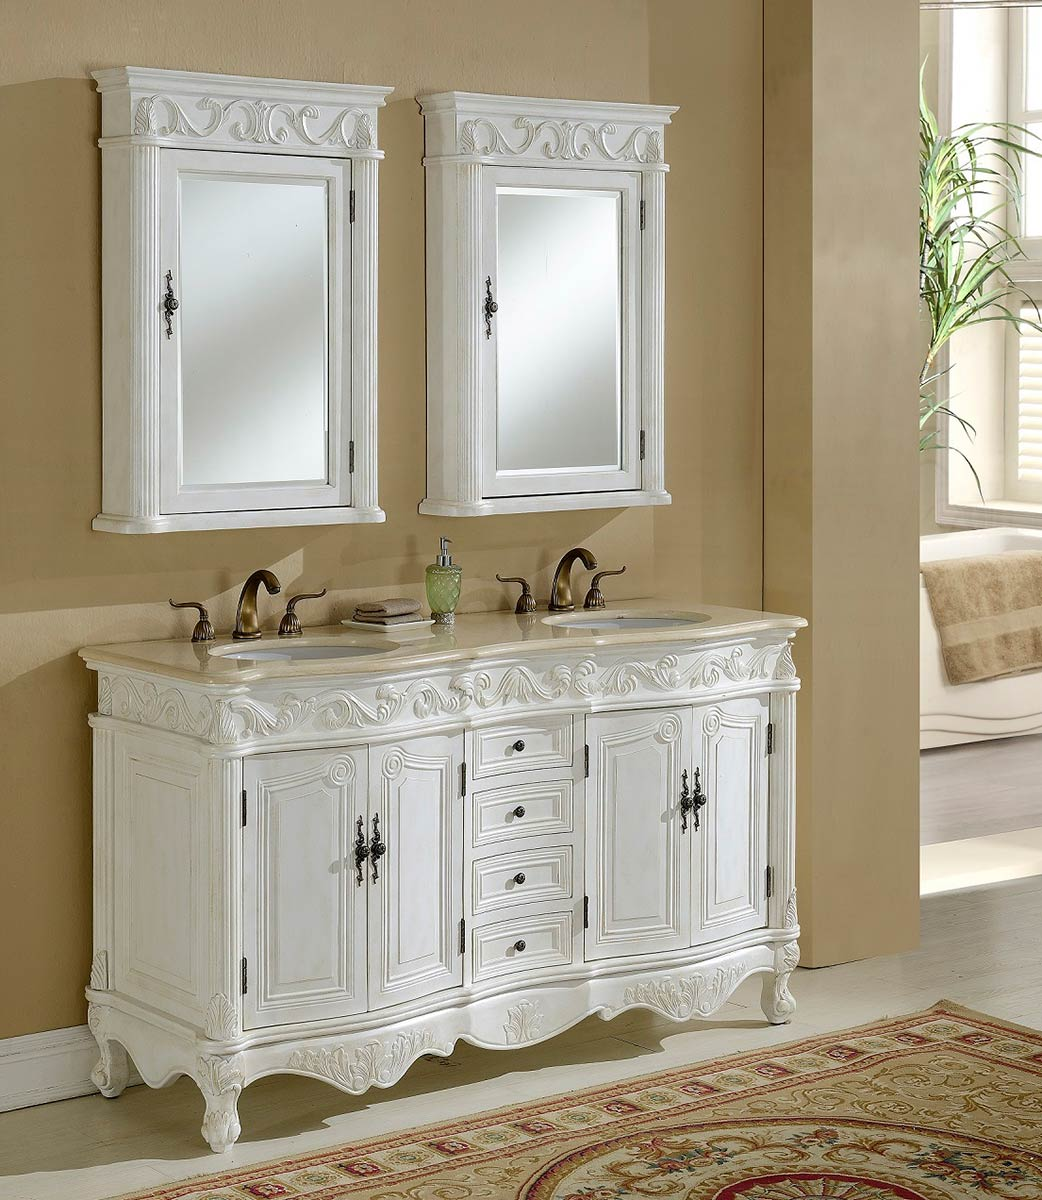 Chelsea Home Villa 60-inch Vanity with Medicine Cabinet - Antique White